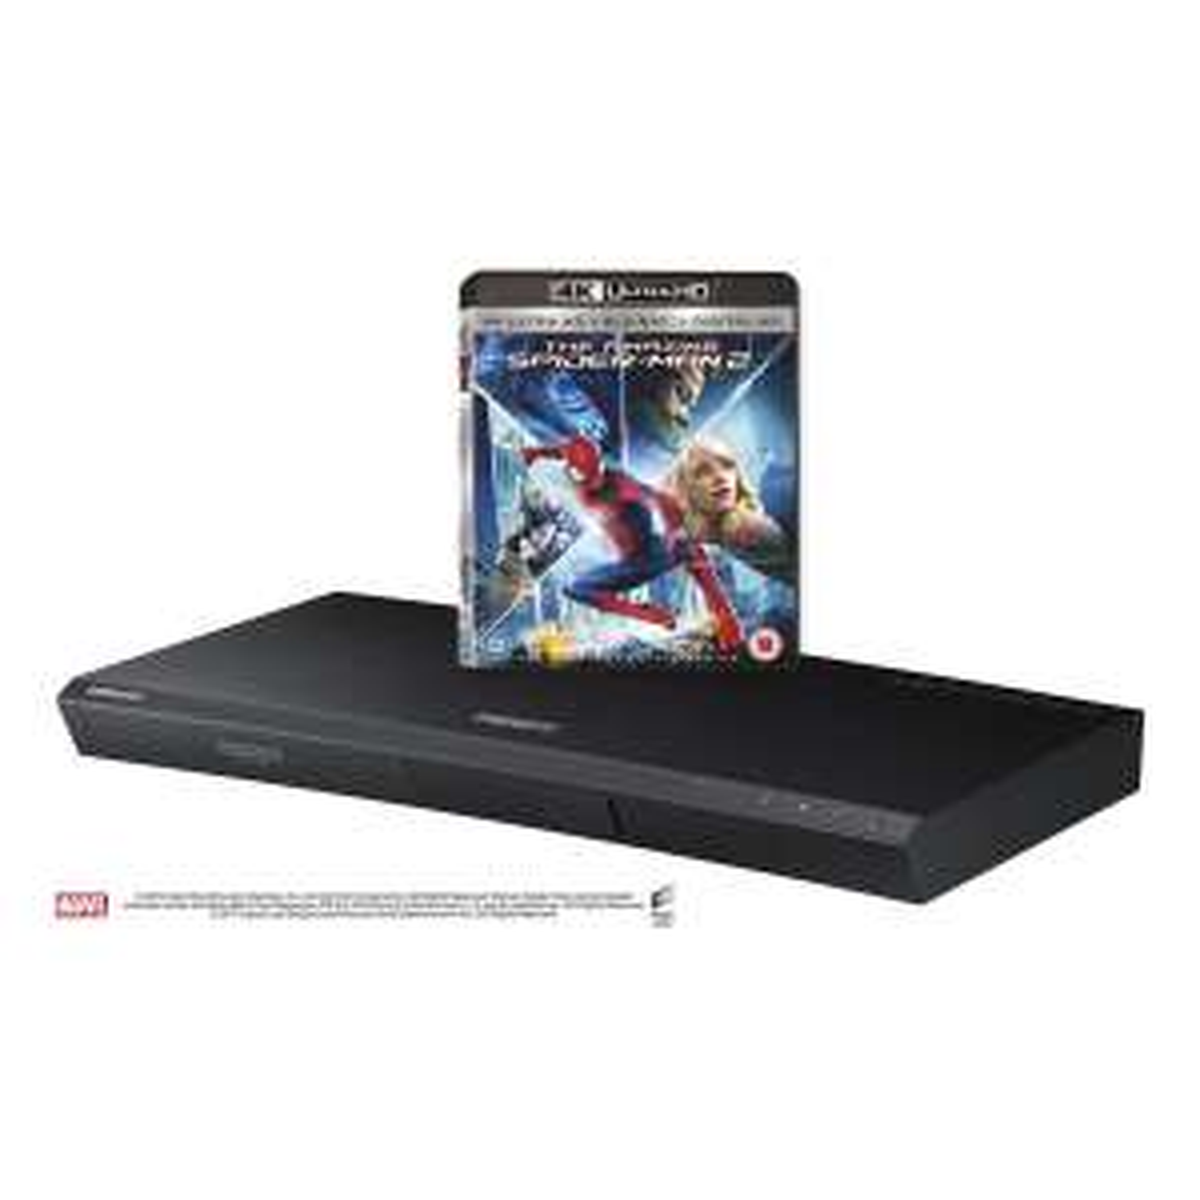 Samsung UBDK8500 4k UHD Blu-ray player at Hughes. £132